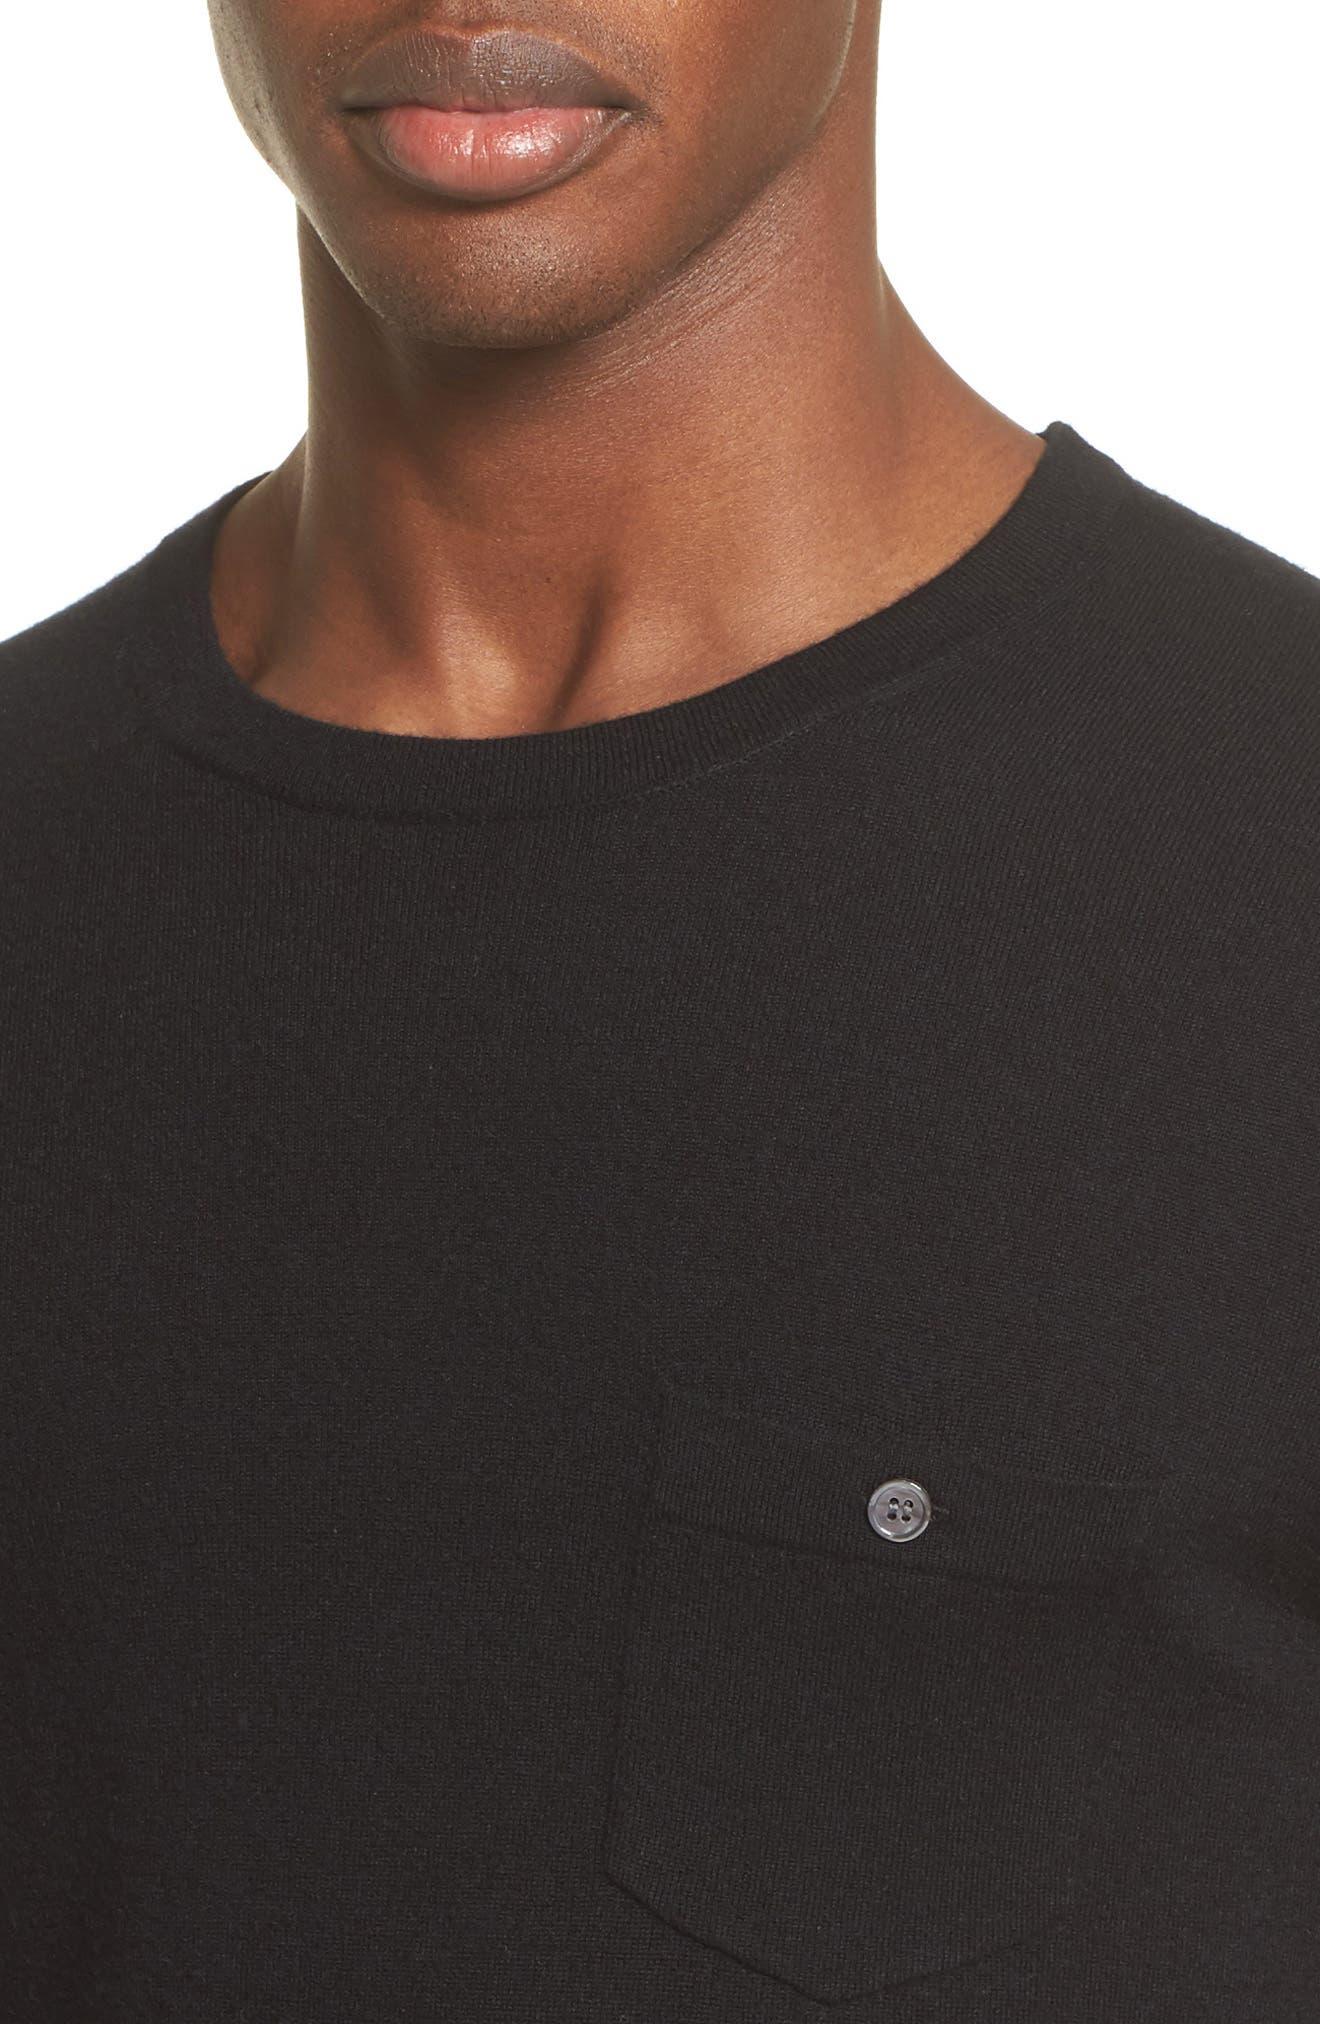 Cashmere Pocket T-Shirt,                             Alternate thumbnail 4, color,                             001